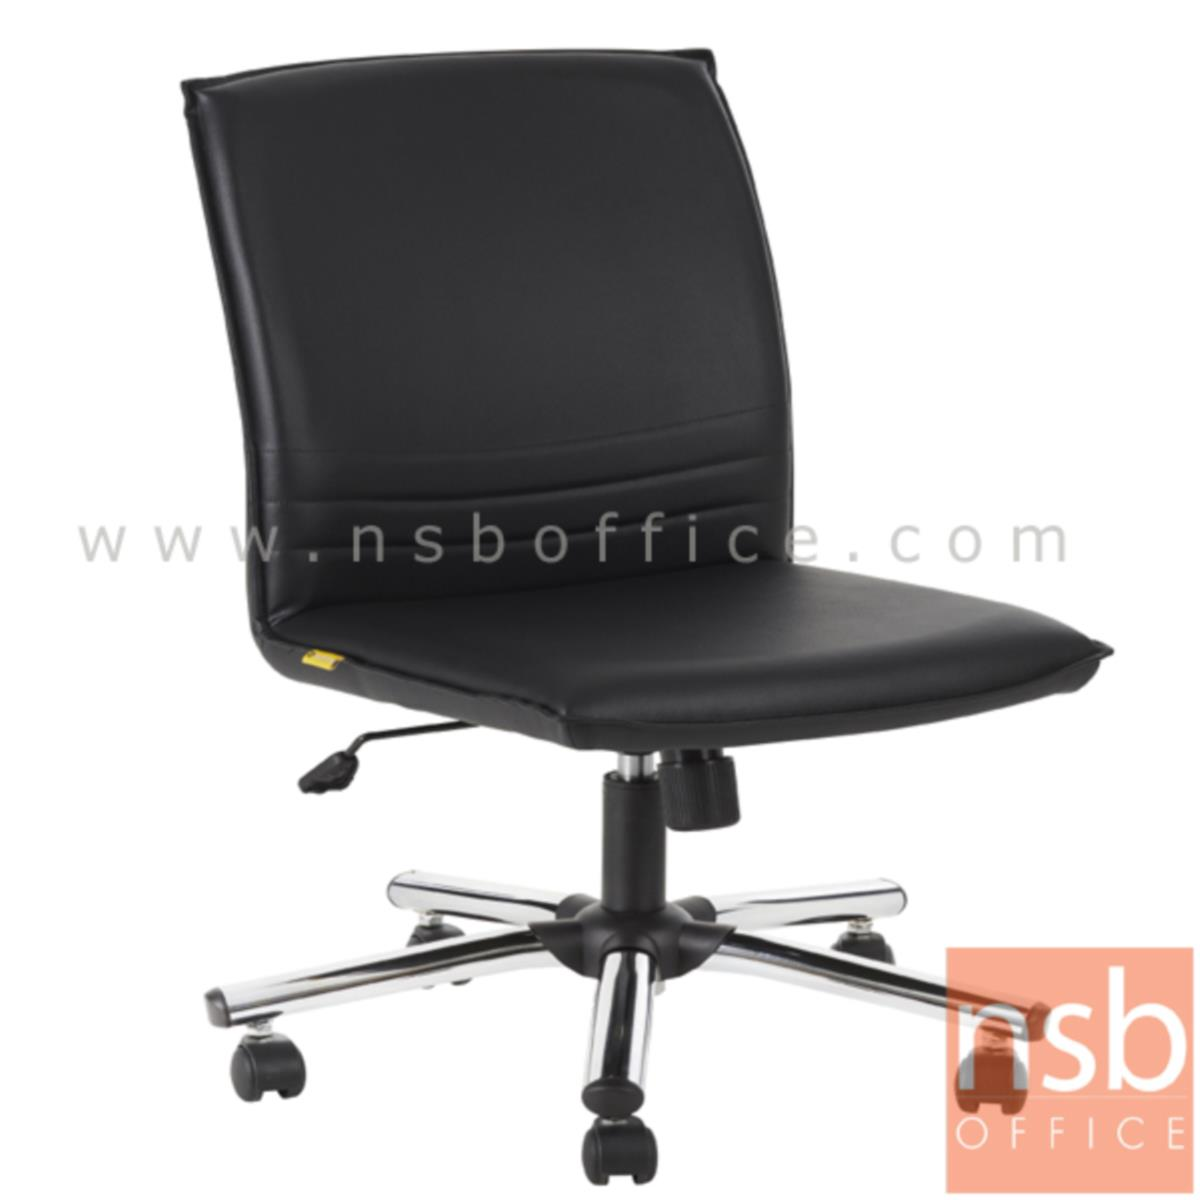 B03A421:เก้าอี้สำนักงาน รุ่น Blackpool (แบล็กพูล)  โช๊คแก๊ส มีก้อนโยก ขาเหล็กชุบโครเมี่ยม